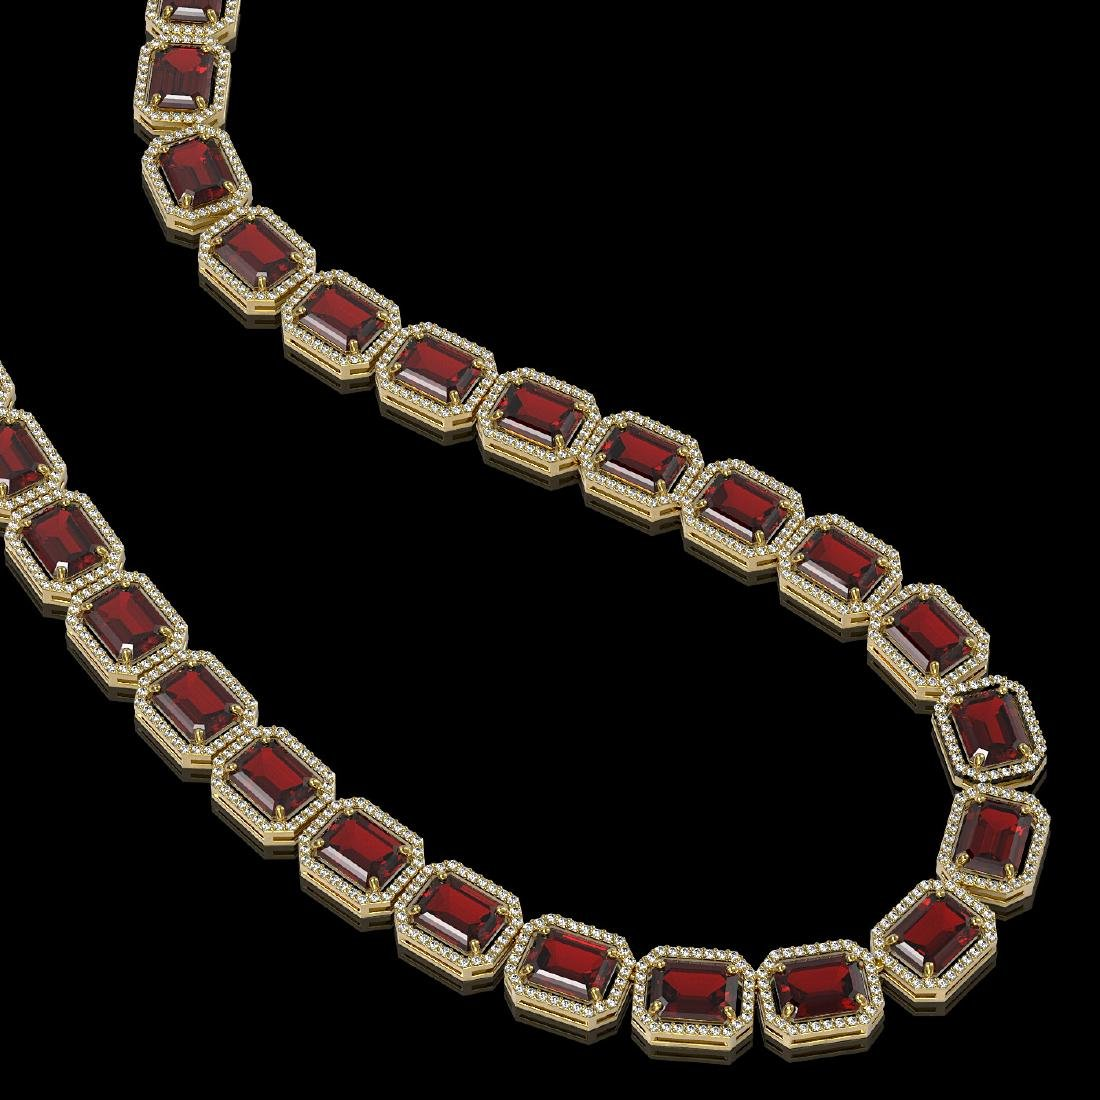 73.44 CTW Garnet & Diamond Halo Necklace 10K Yellow